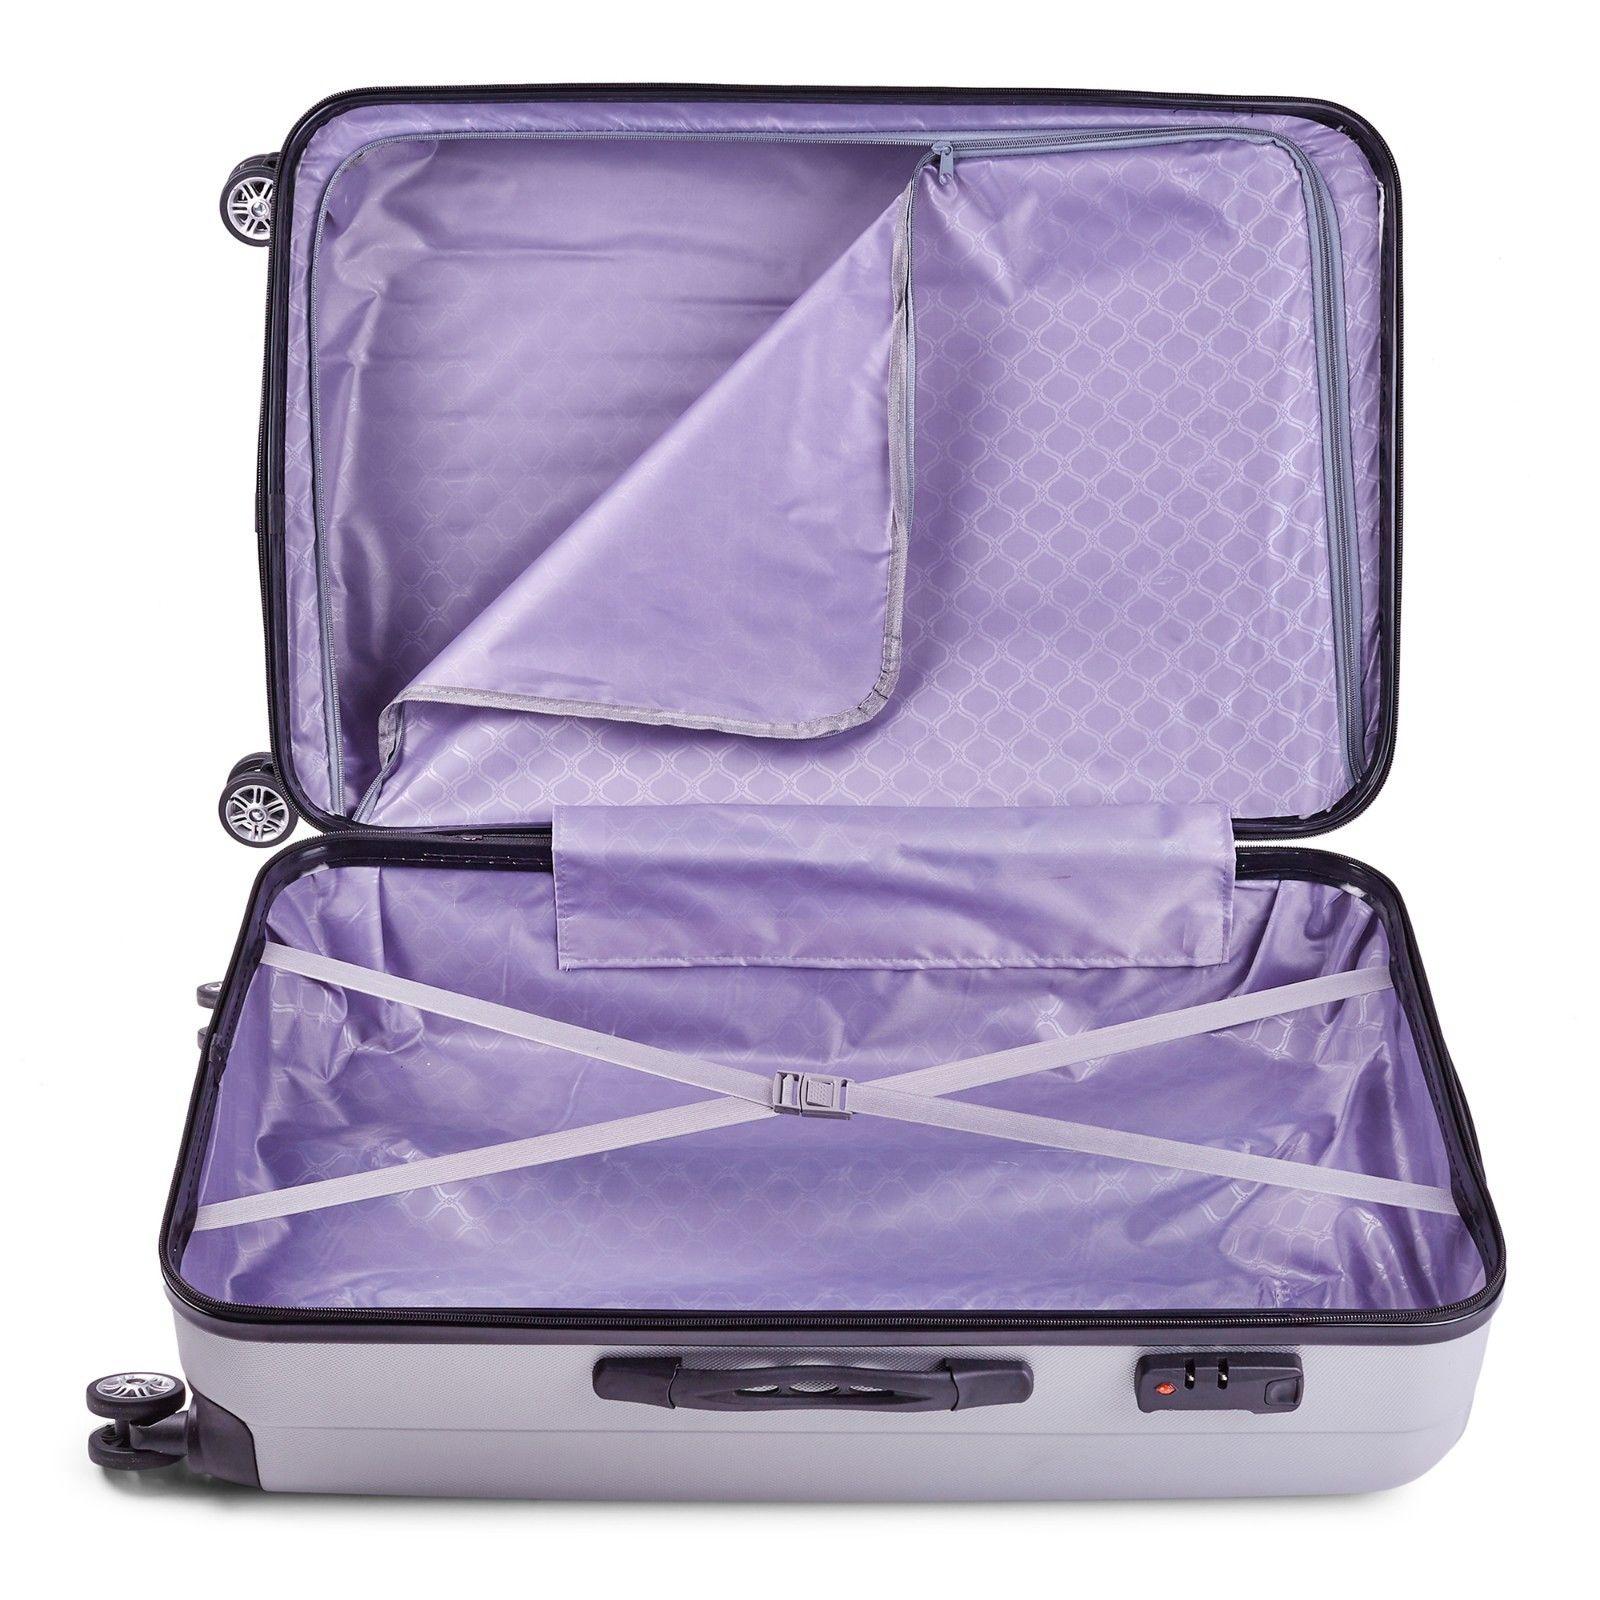 Milano-Premium-3pc-ABS-Luggage-Suitcase-Luxury-Hard-Case-Shockproof-Travel-Set thumbnail 36